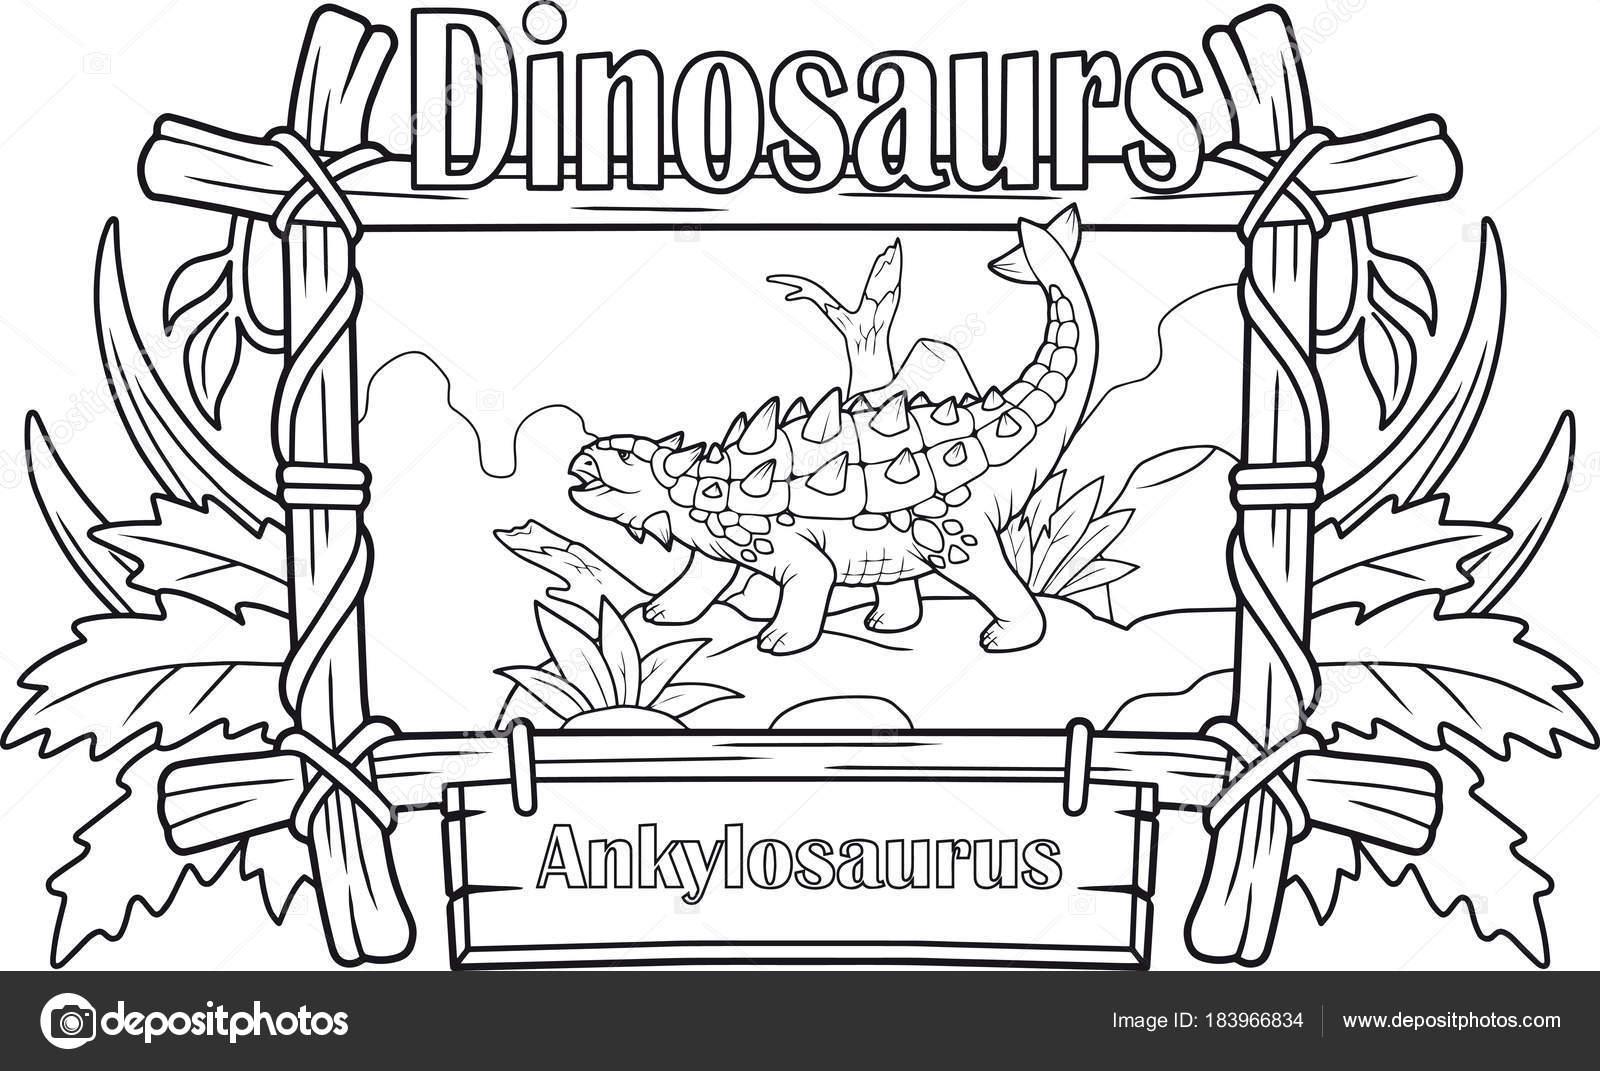 Dinosaurio Prehistórico Ankylosaurus Libro Para Colorear — Archivo ...